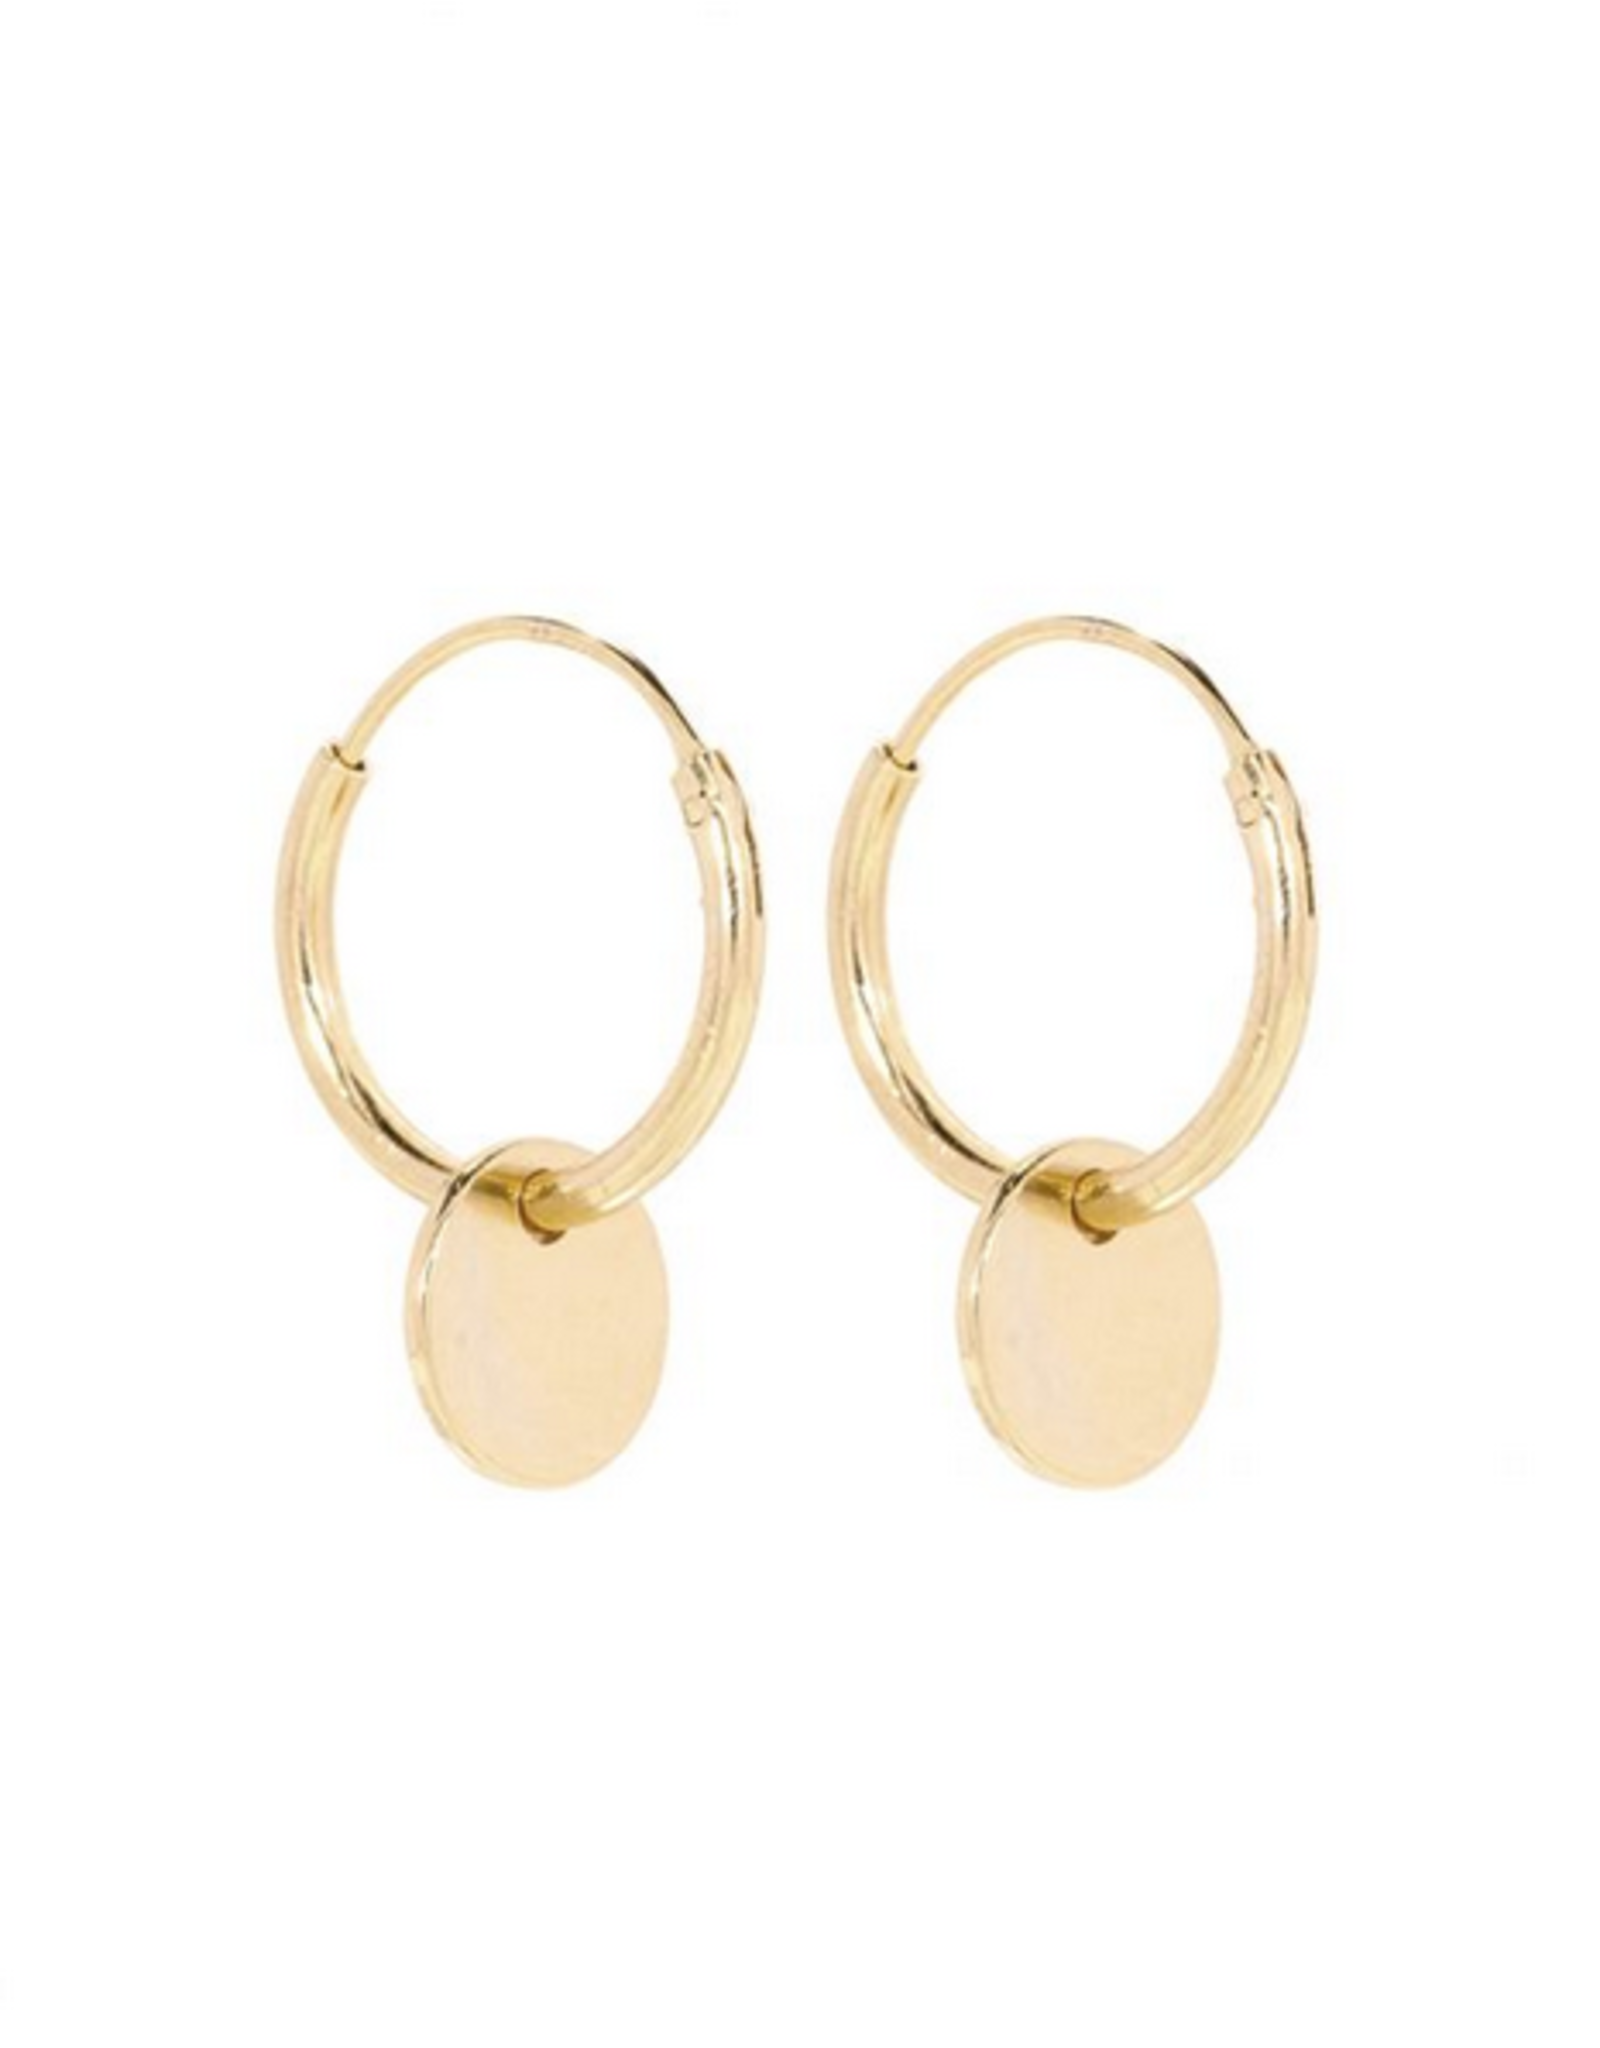 Miab Miab - Oorbellen goud - front charm